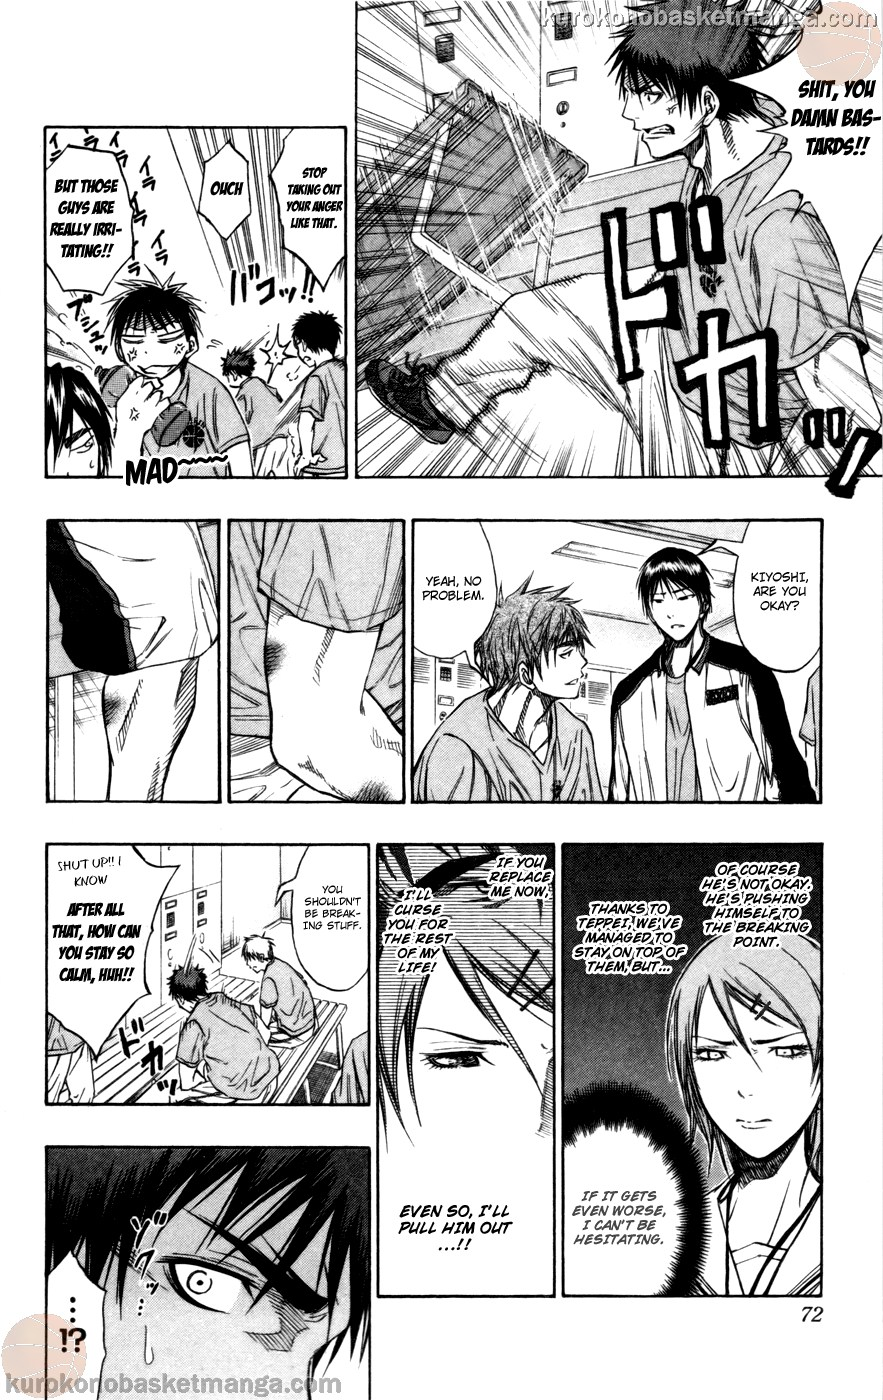 Kuroko no Basket Manga Chapter 103 - Image 06